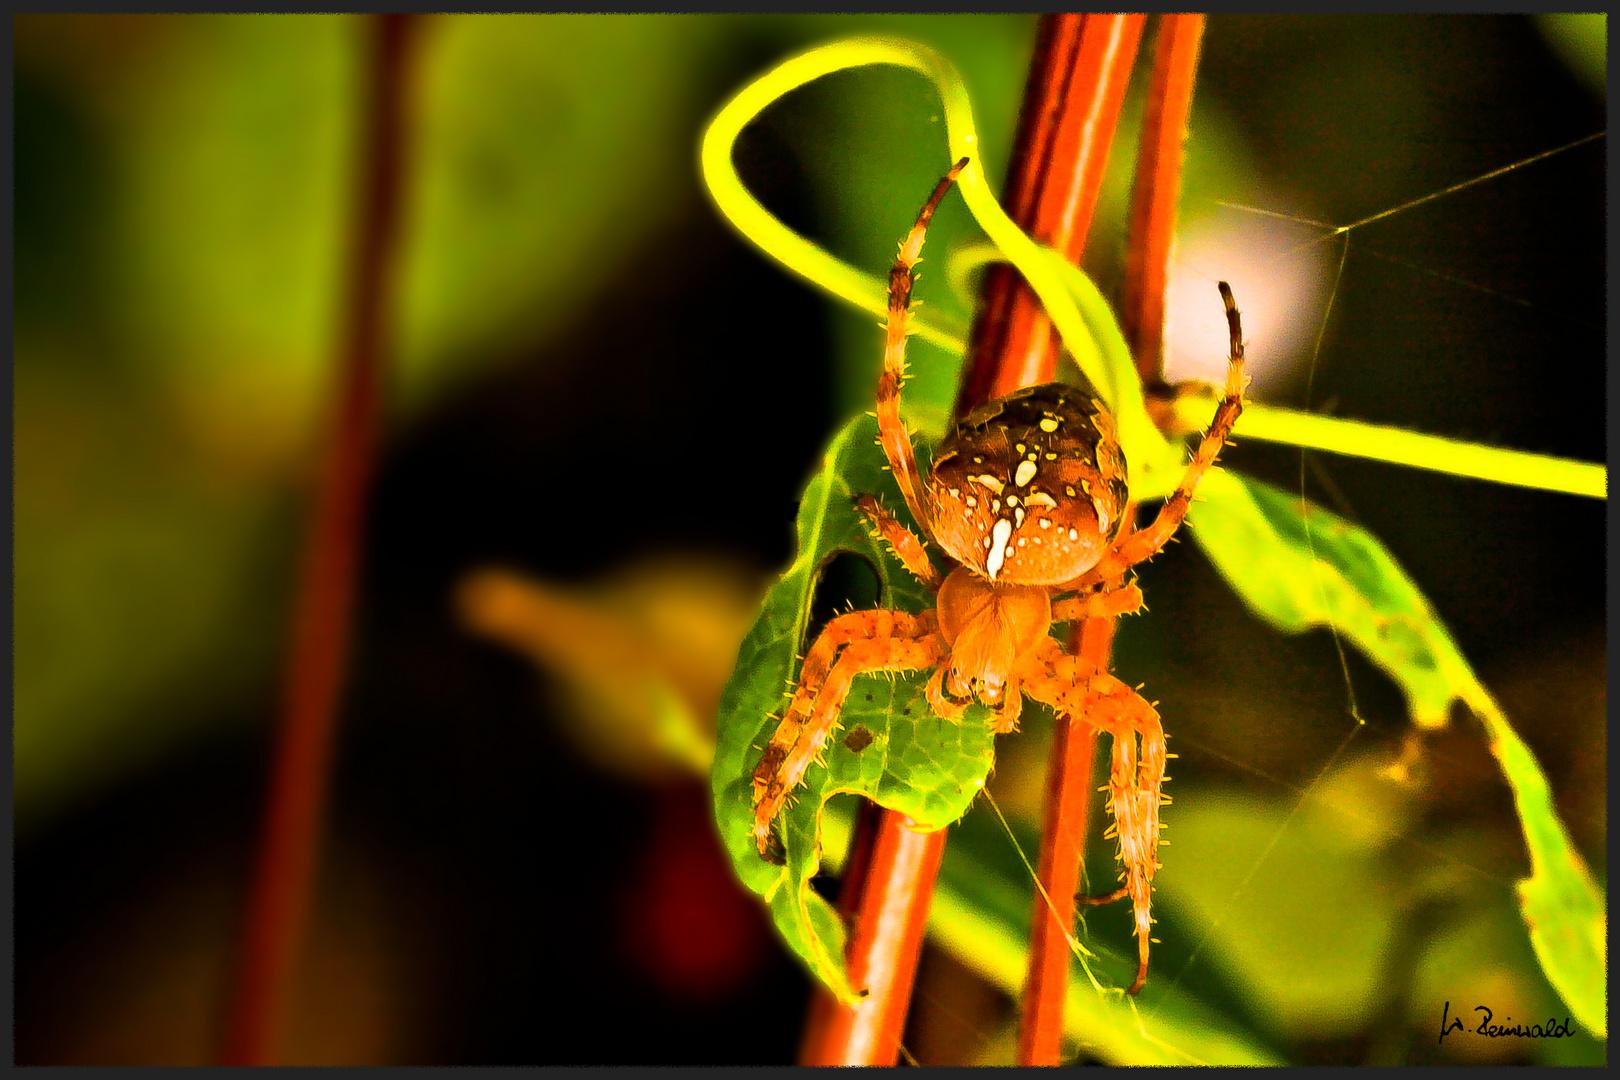 ~ Spinne 1 ~